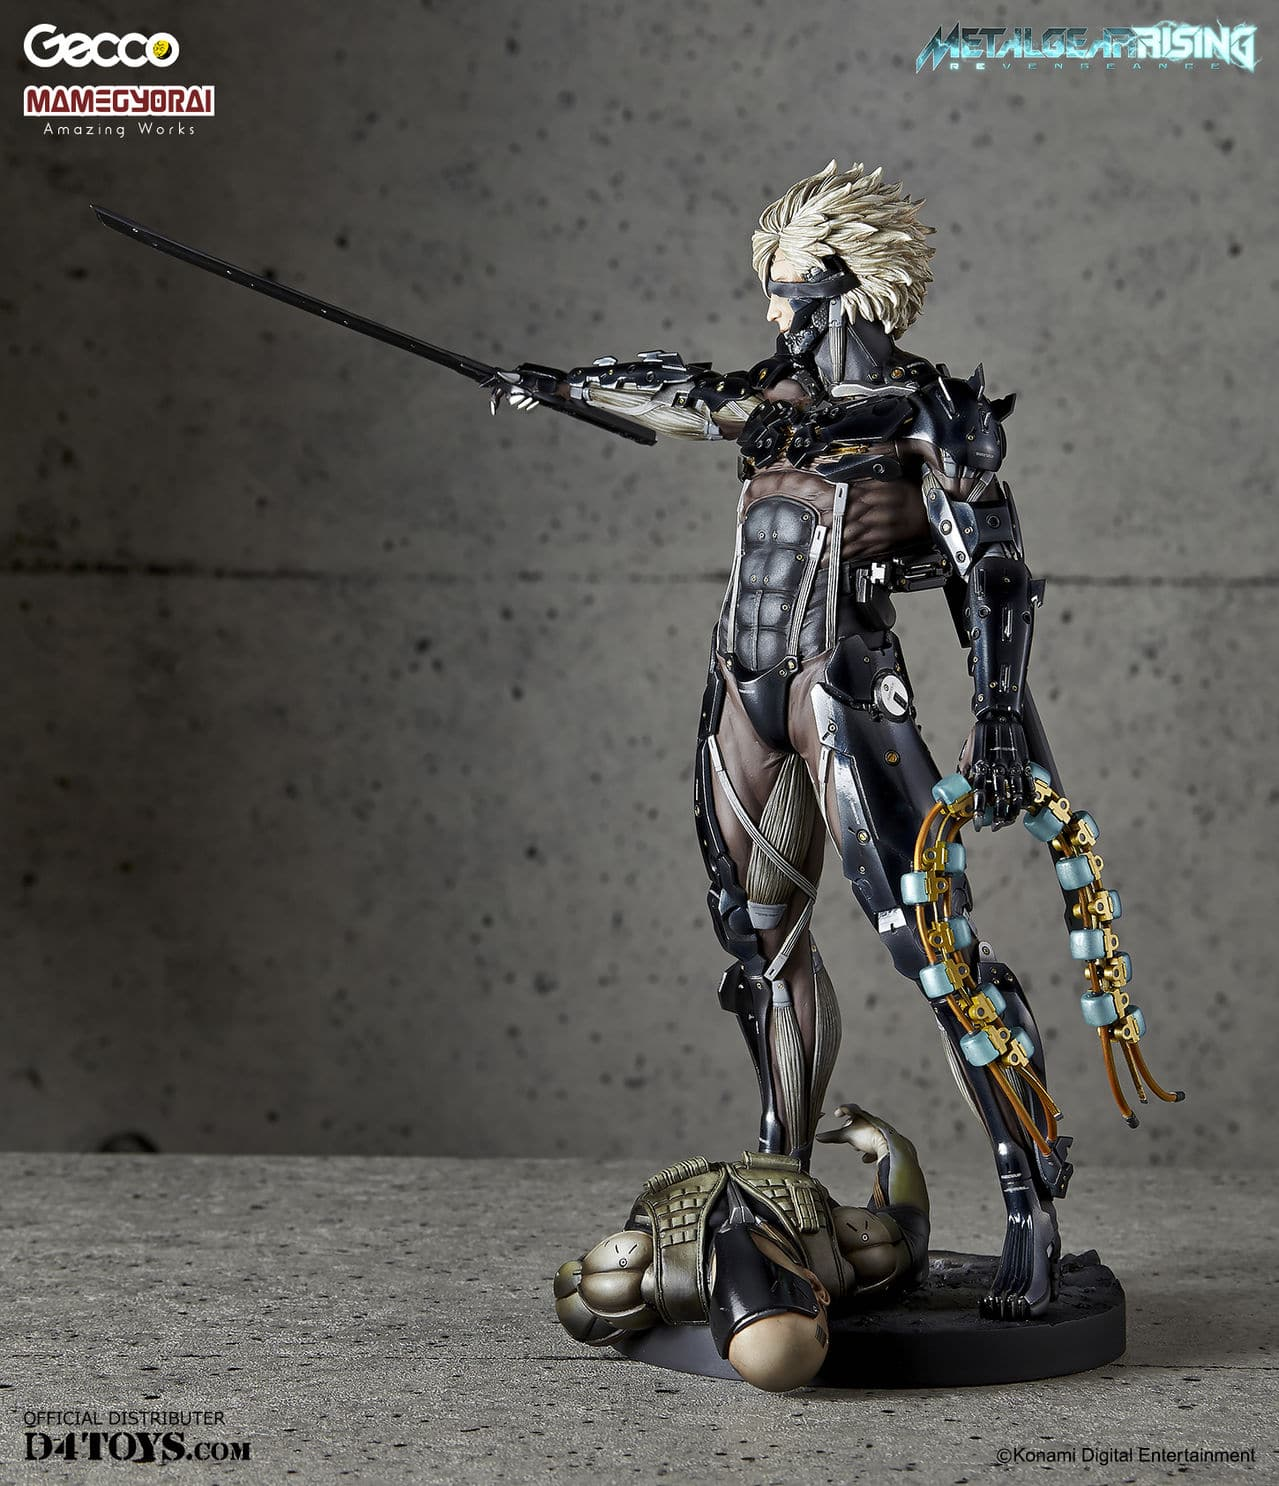 [Gecco,  Mamegyorai] Metal Gear Rising: Revengeance - RAIDEN White Armor 1/6 - SDCC2015 Exclusive - Página 2 D4_006